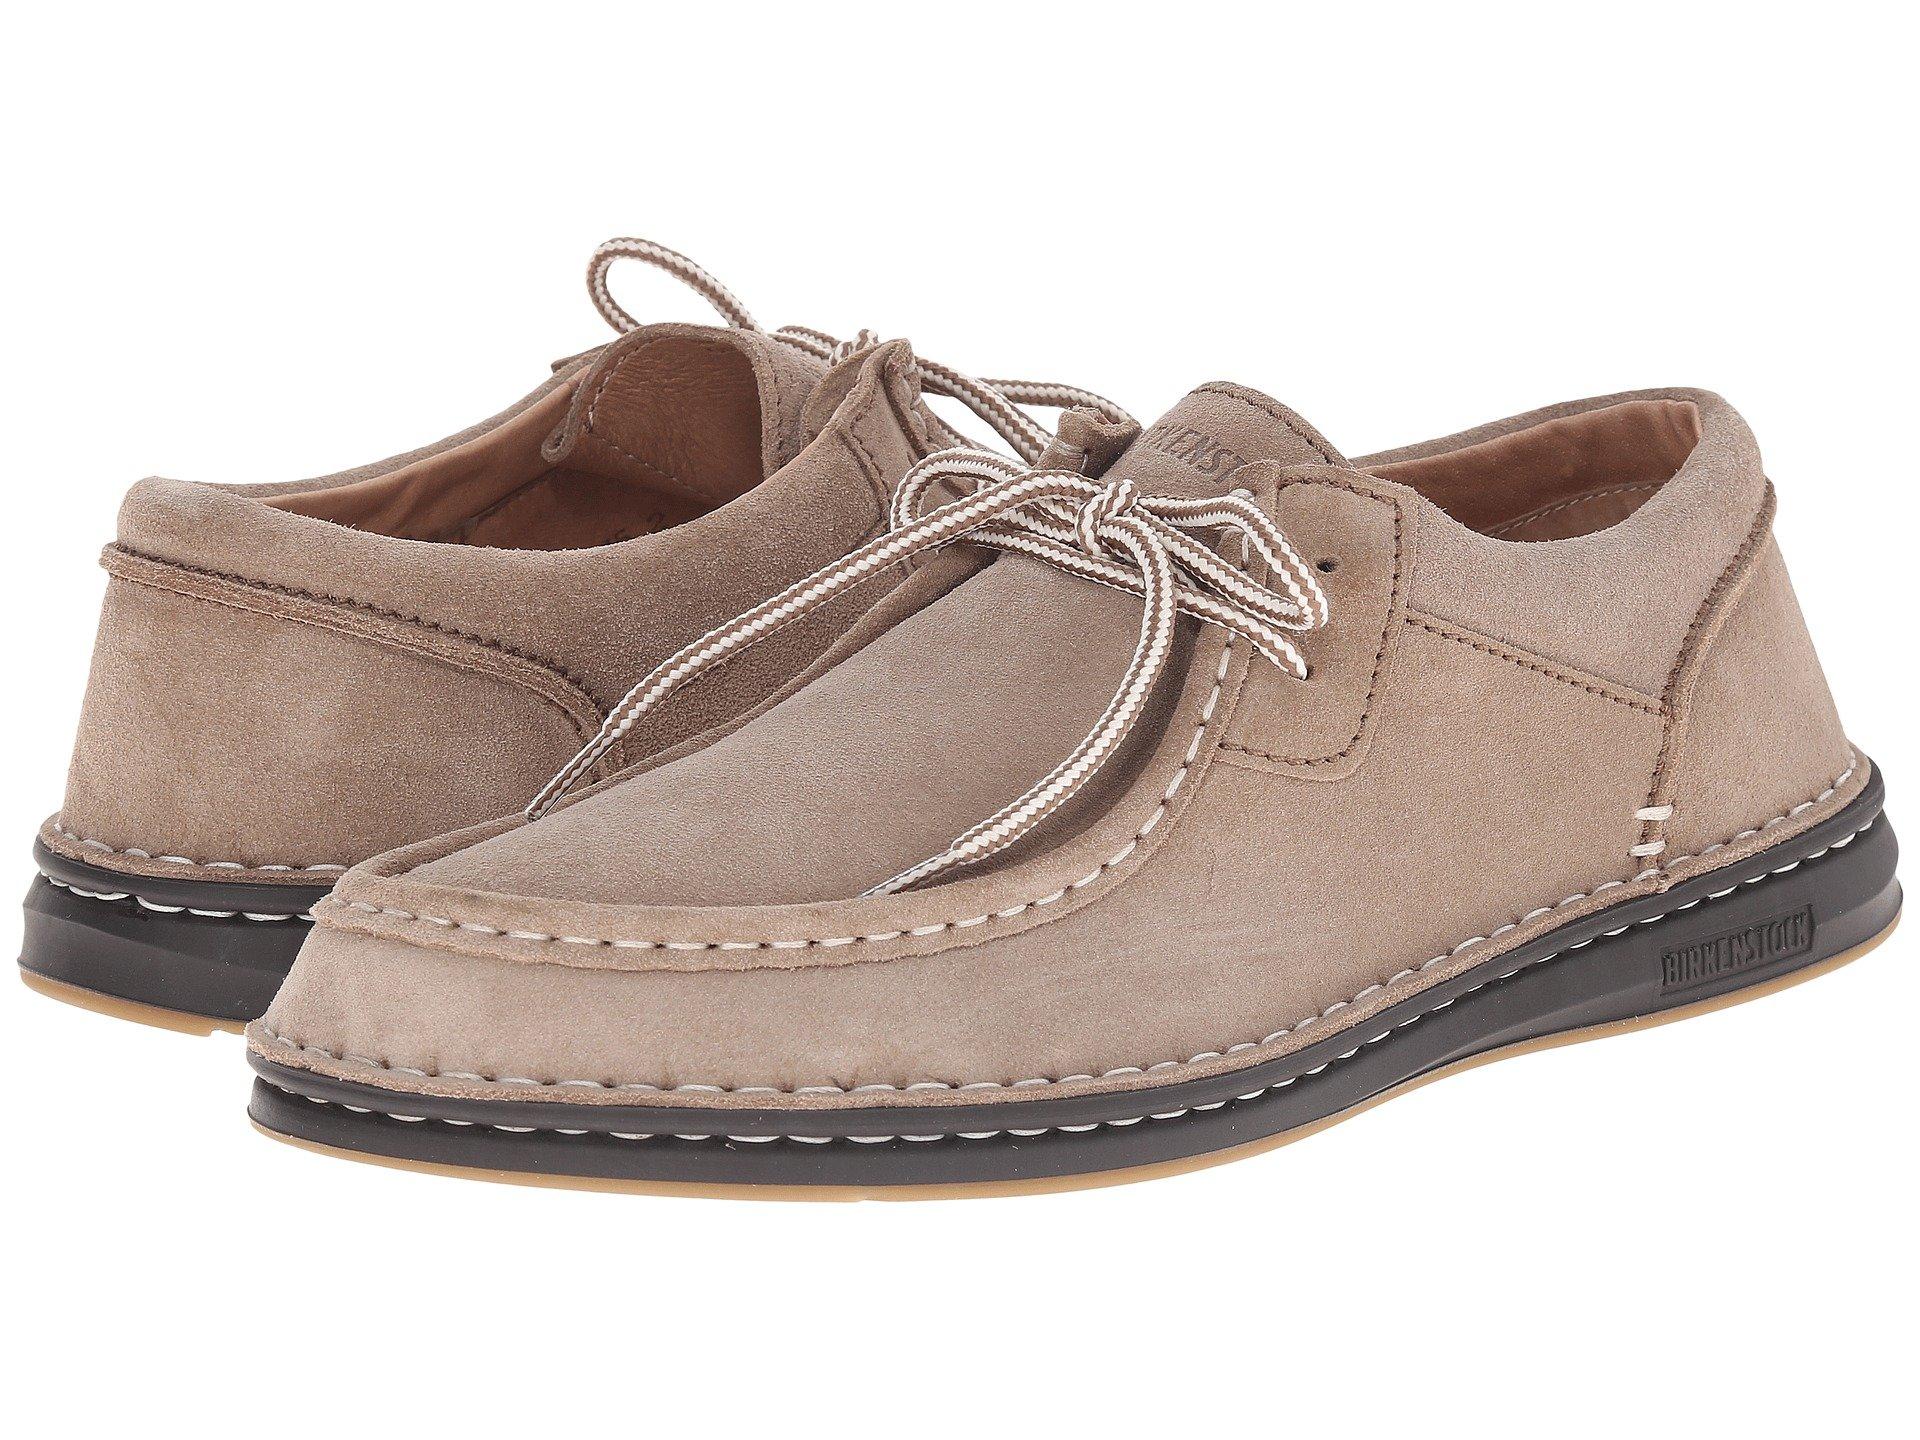 8c10334e1294 Men s Birkenstock Shoes + FREE SHIPPING